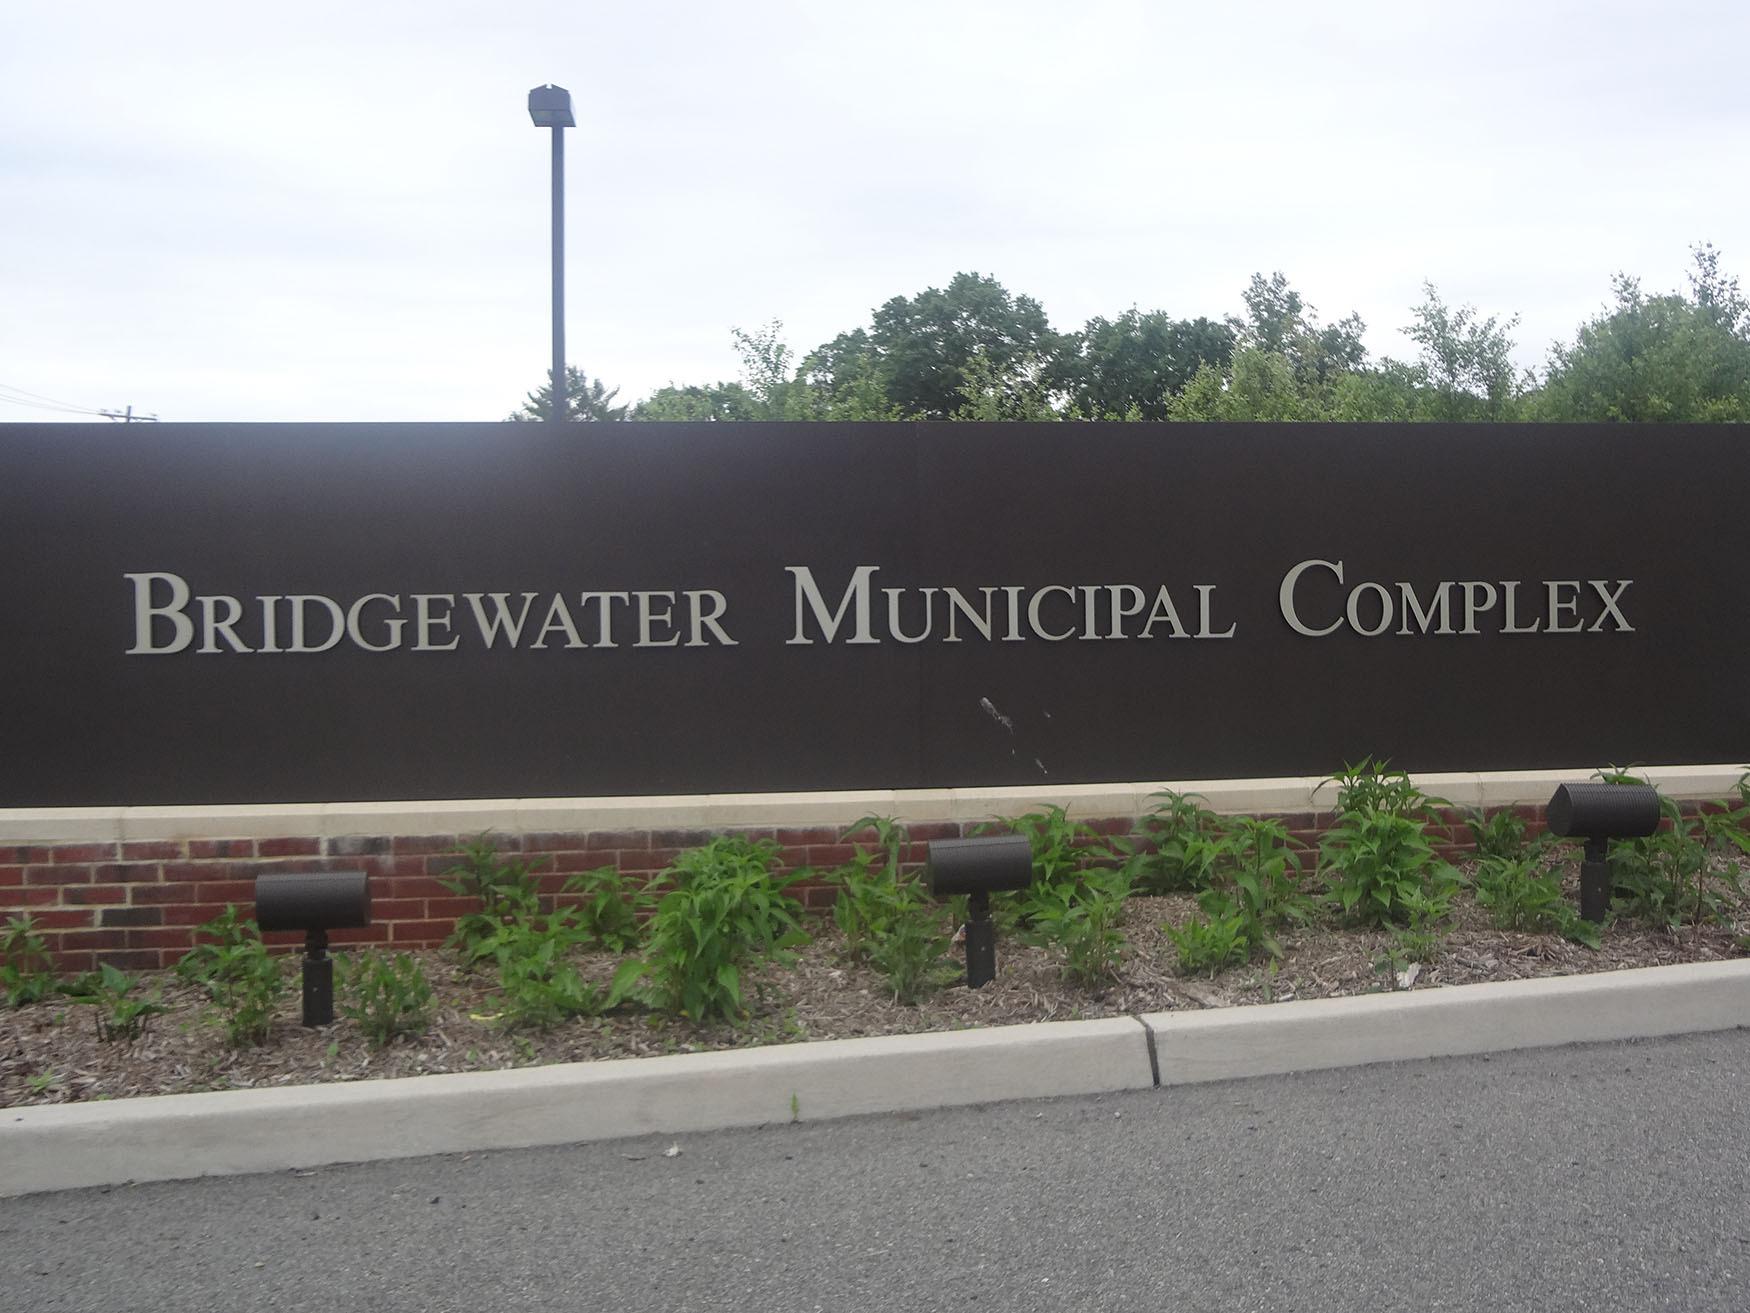 8b61acac77a71534f21a_Bridgewater_municipal.jpg